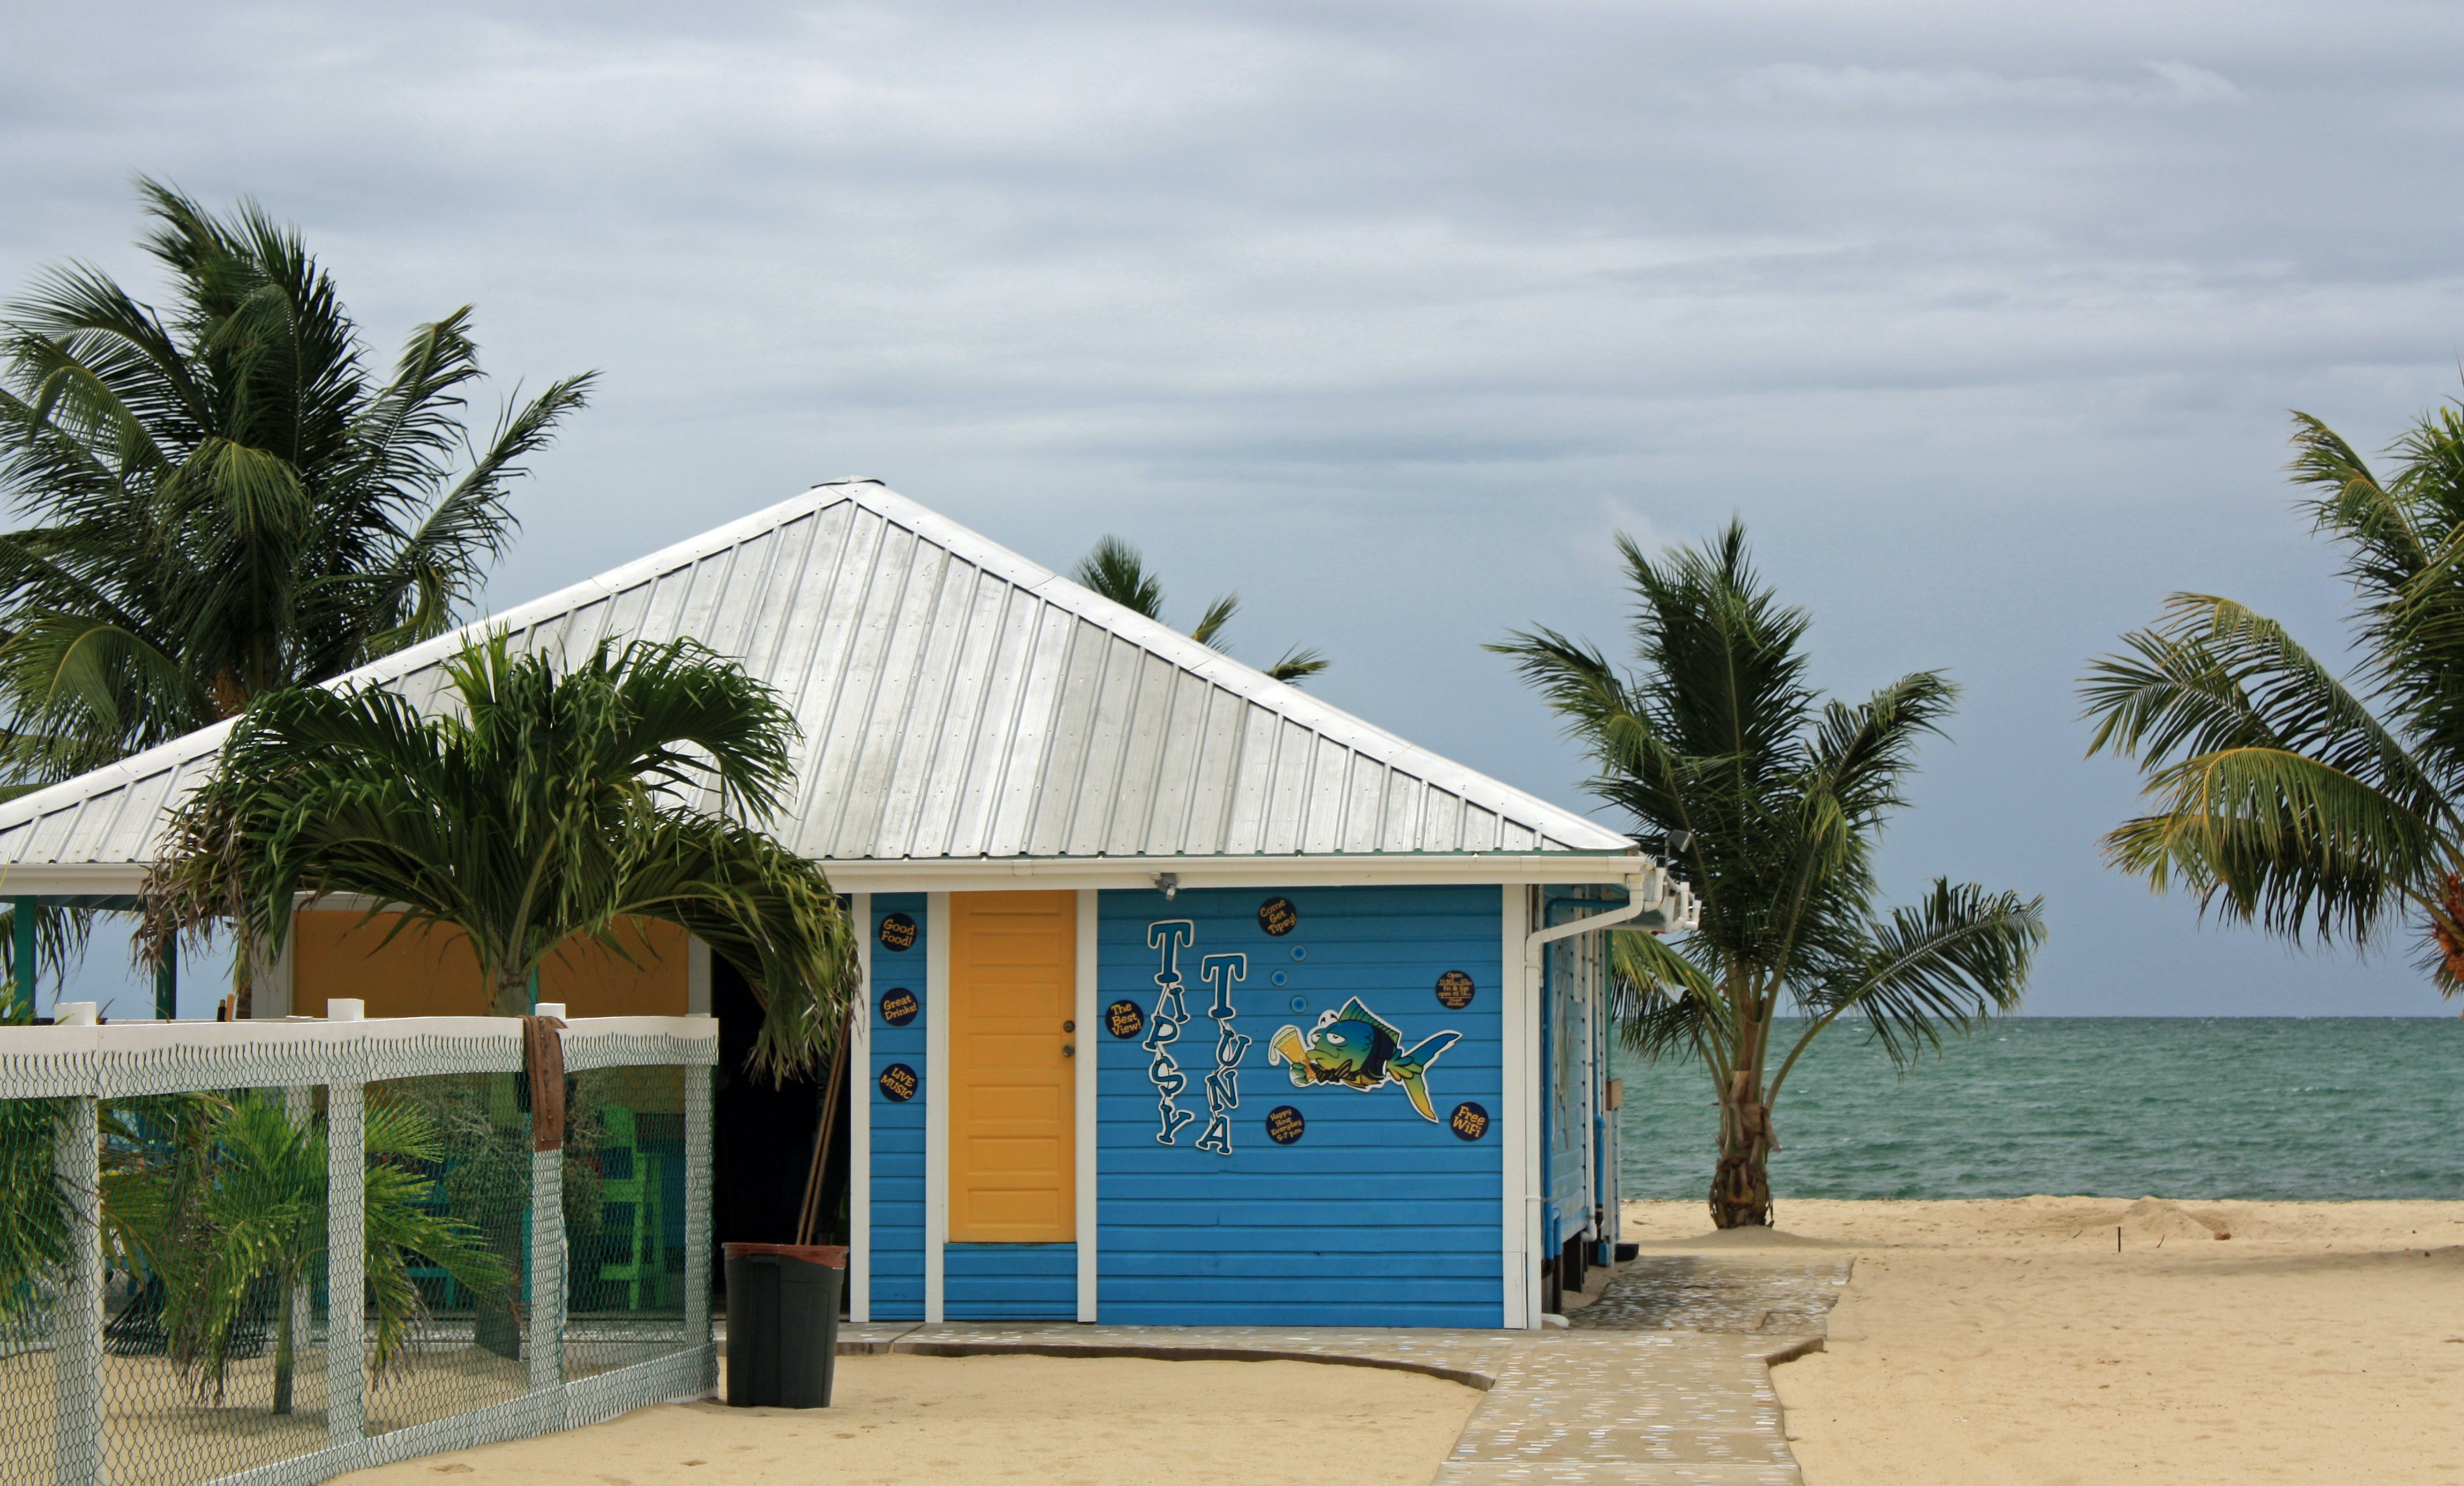 Free stock photo of beach, belize, hut, palm tree